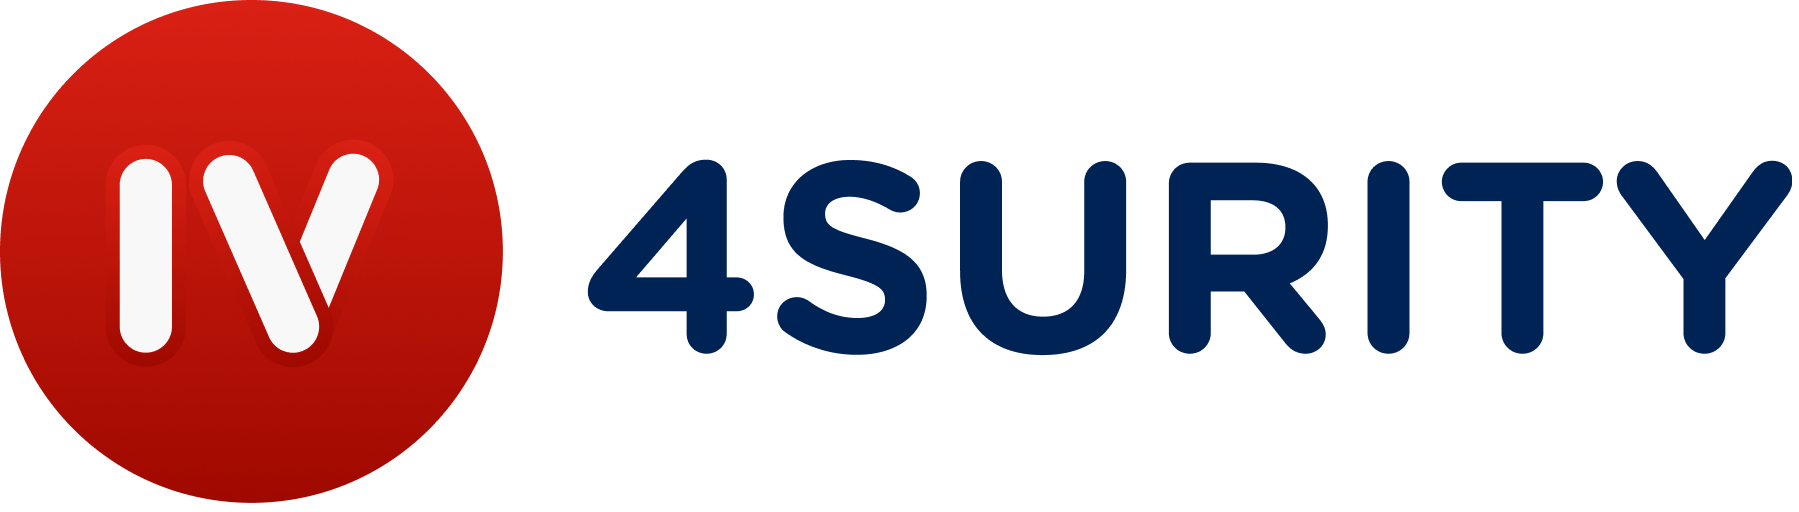 4Surity